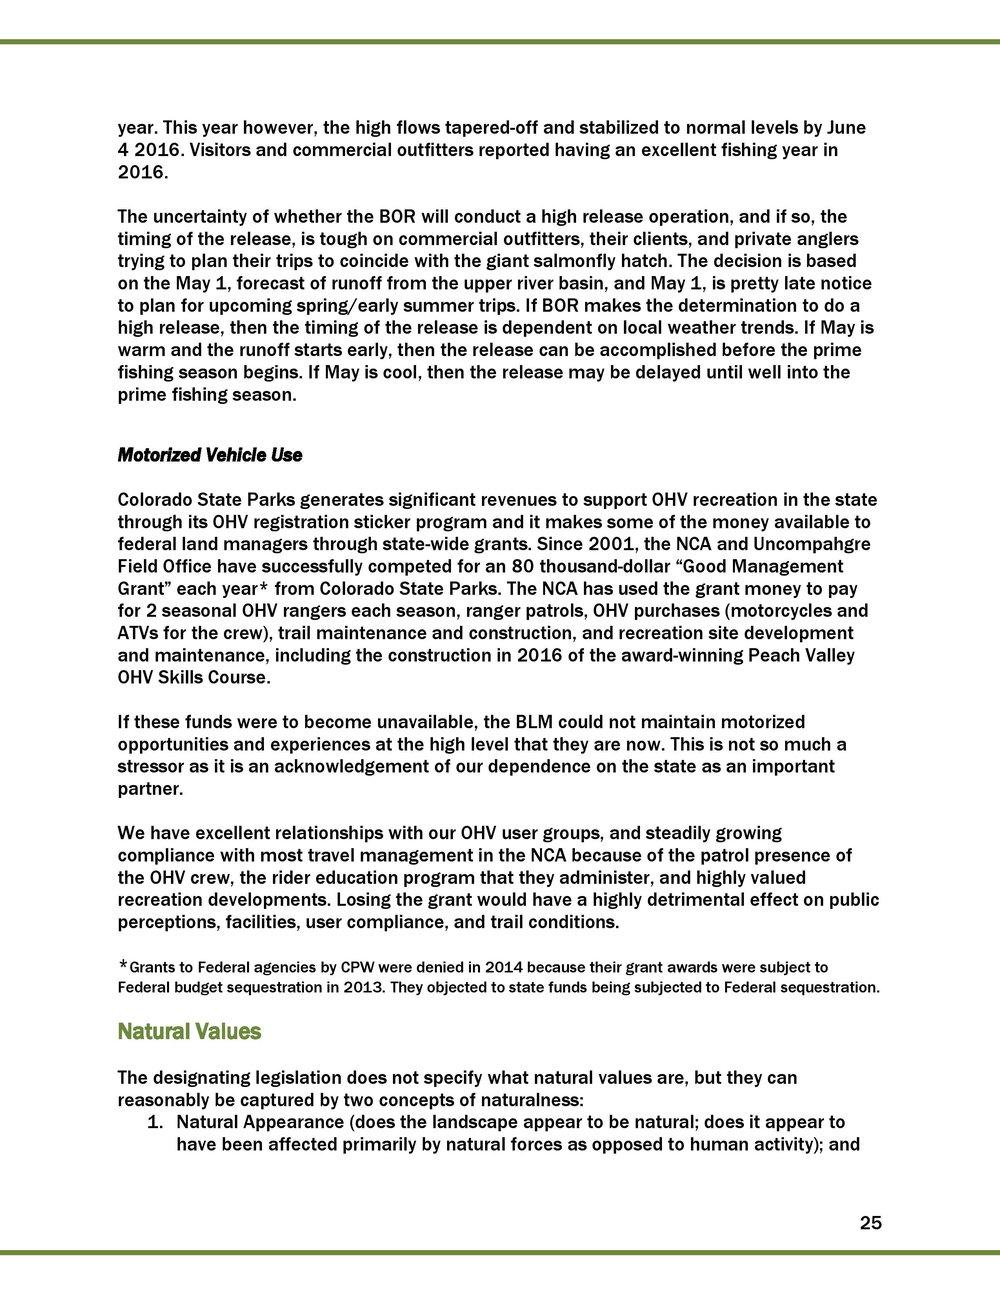 2016 FINAL GGNCA REPORT_2017_02_01-page-026.jpg